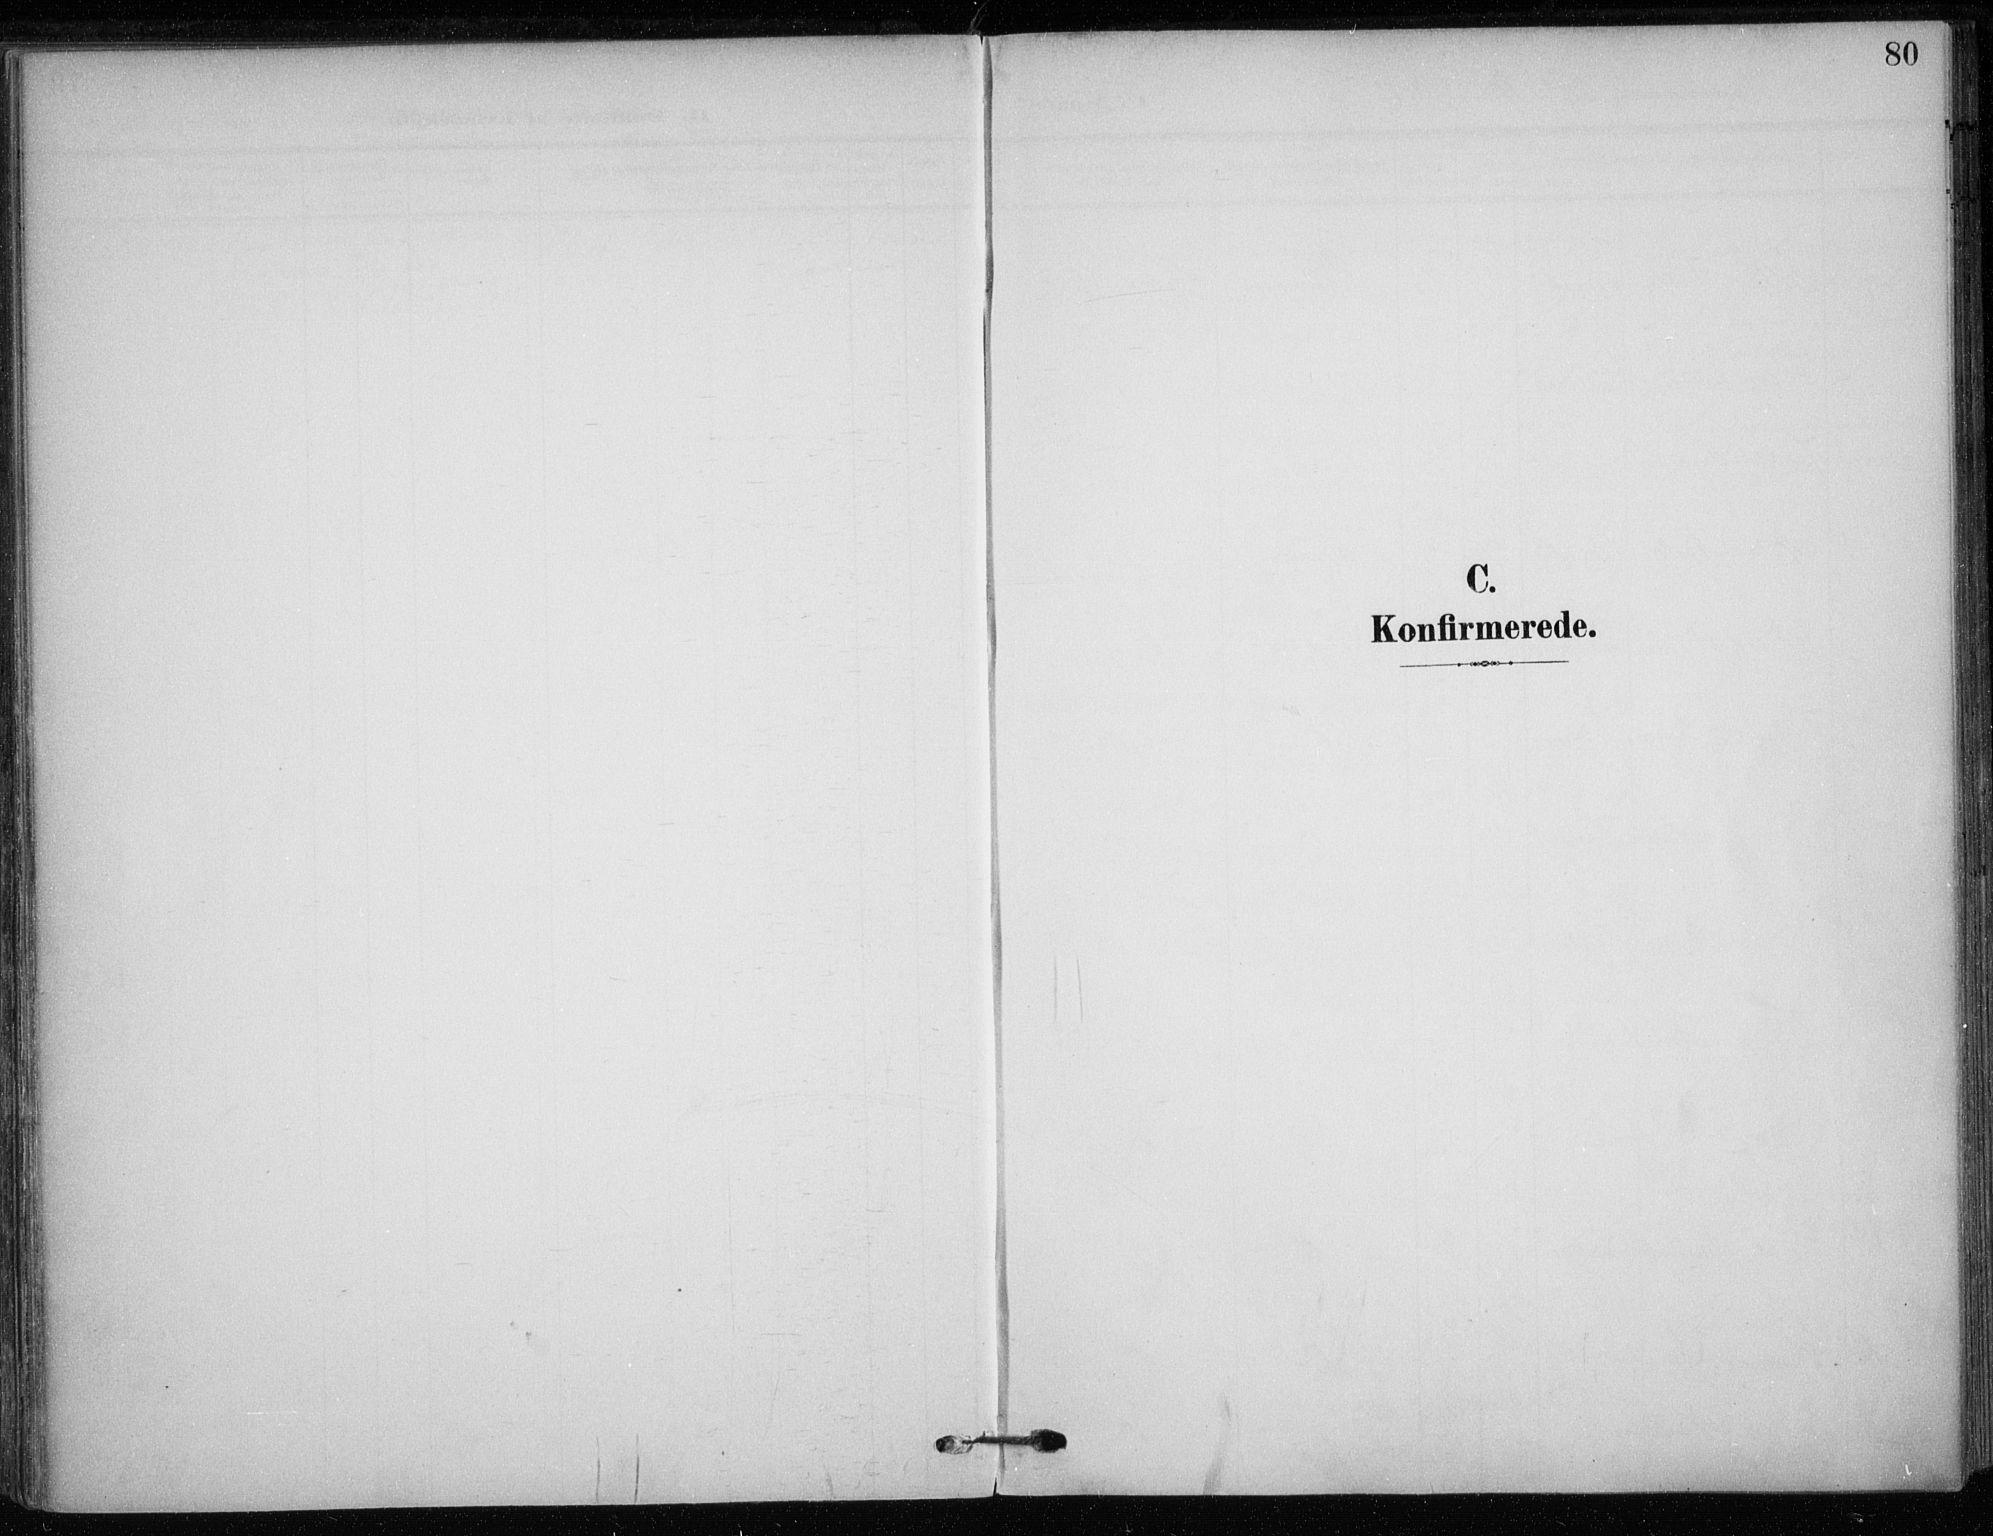 SATØ, Hammerfest sokneprestembete, Ministerialbok nr. 14, 1906-1916, s. 80